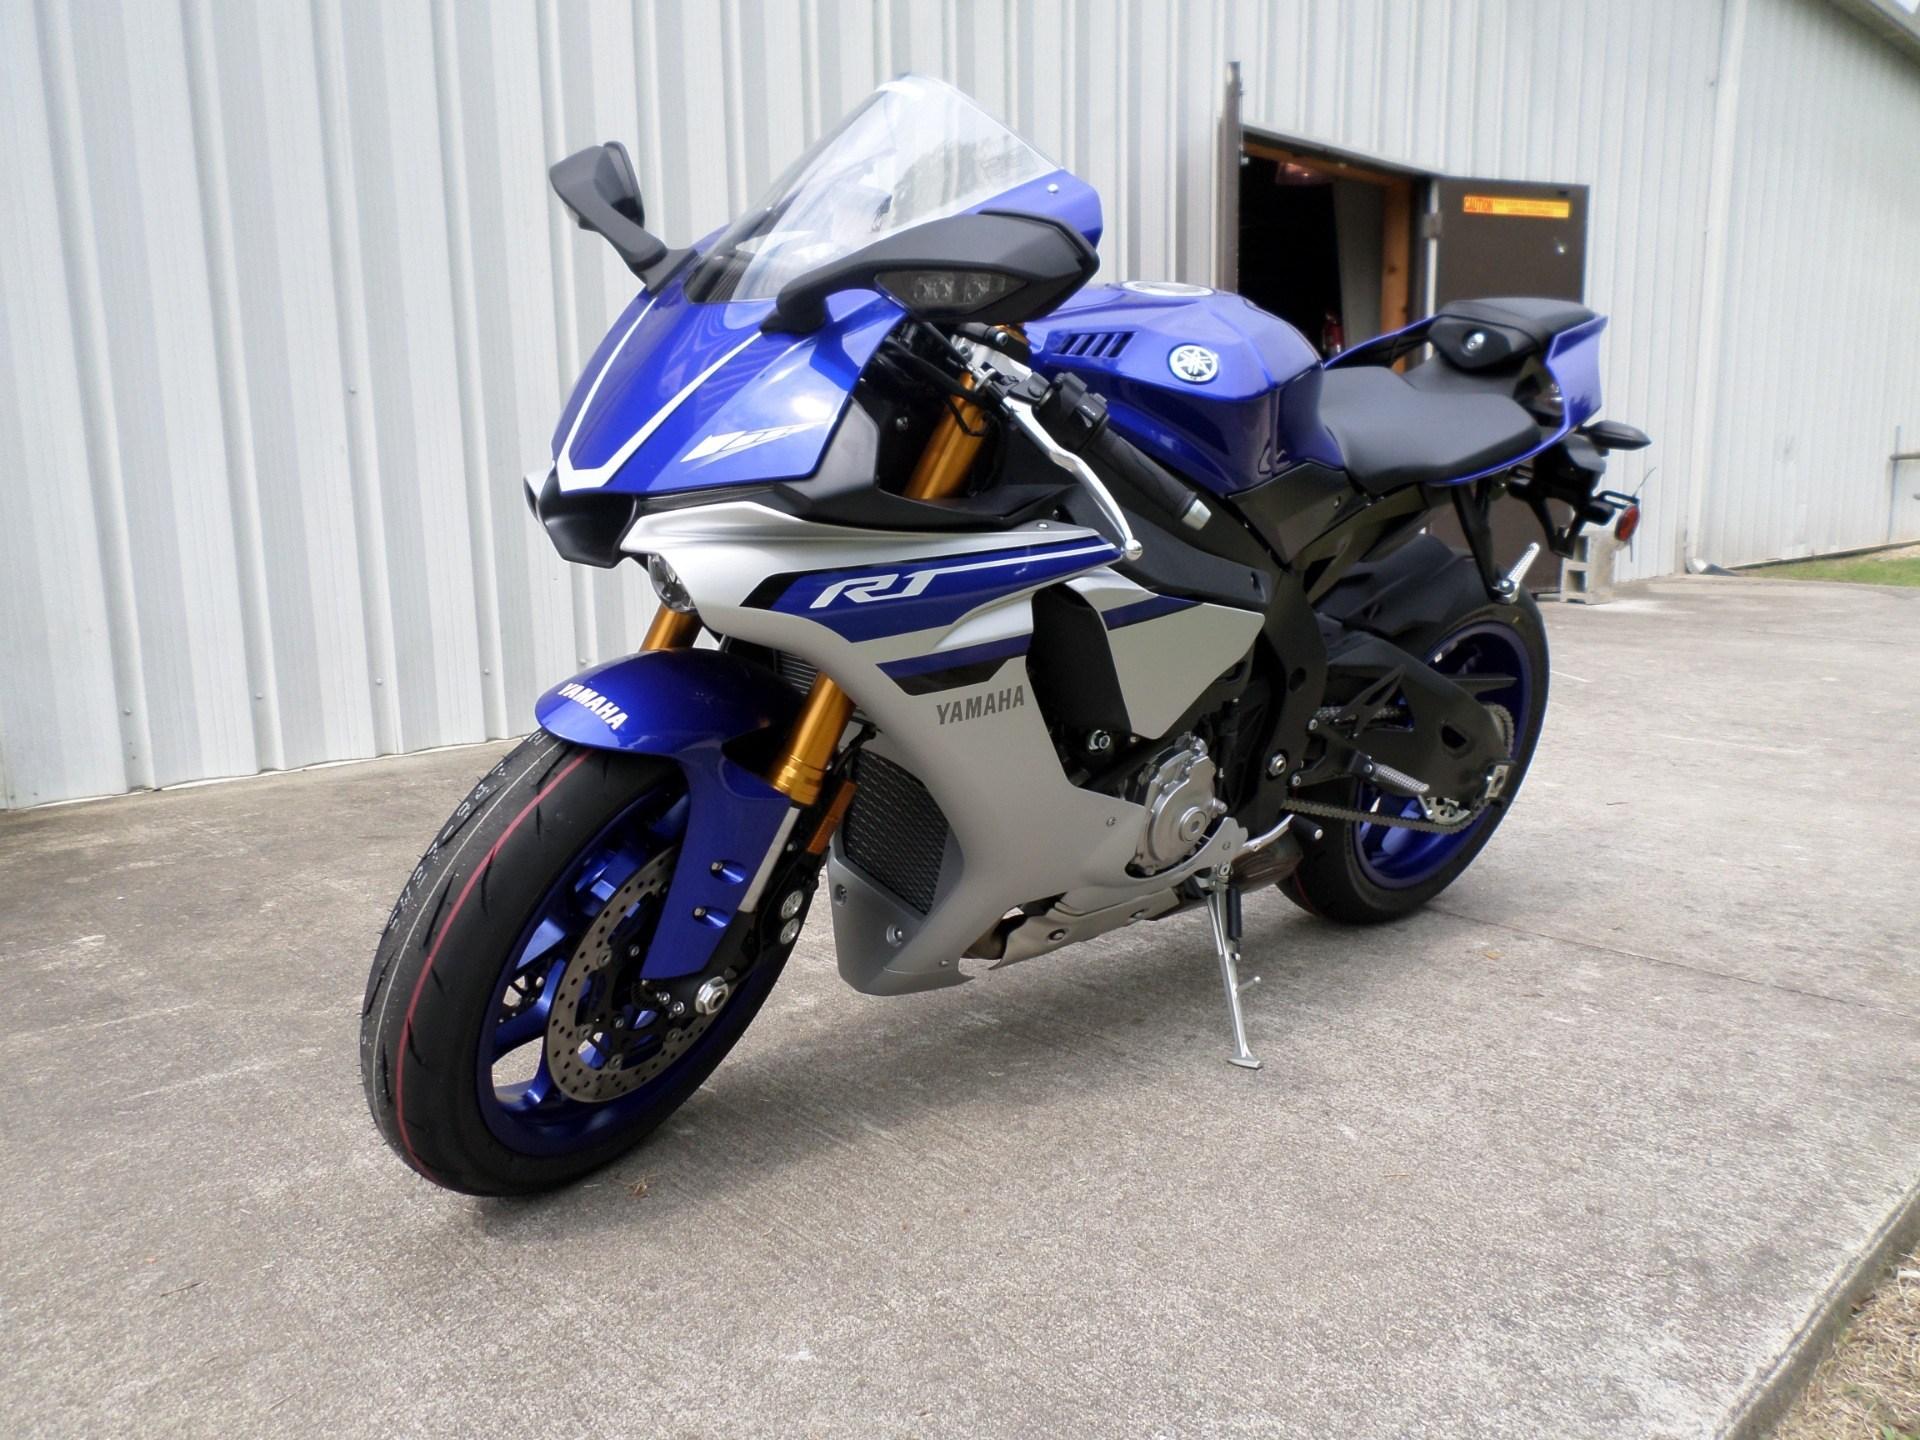 2016 Yamaha YZF-R1 8